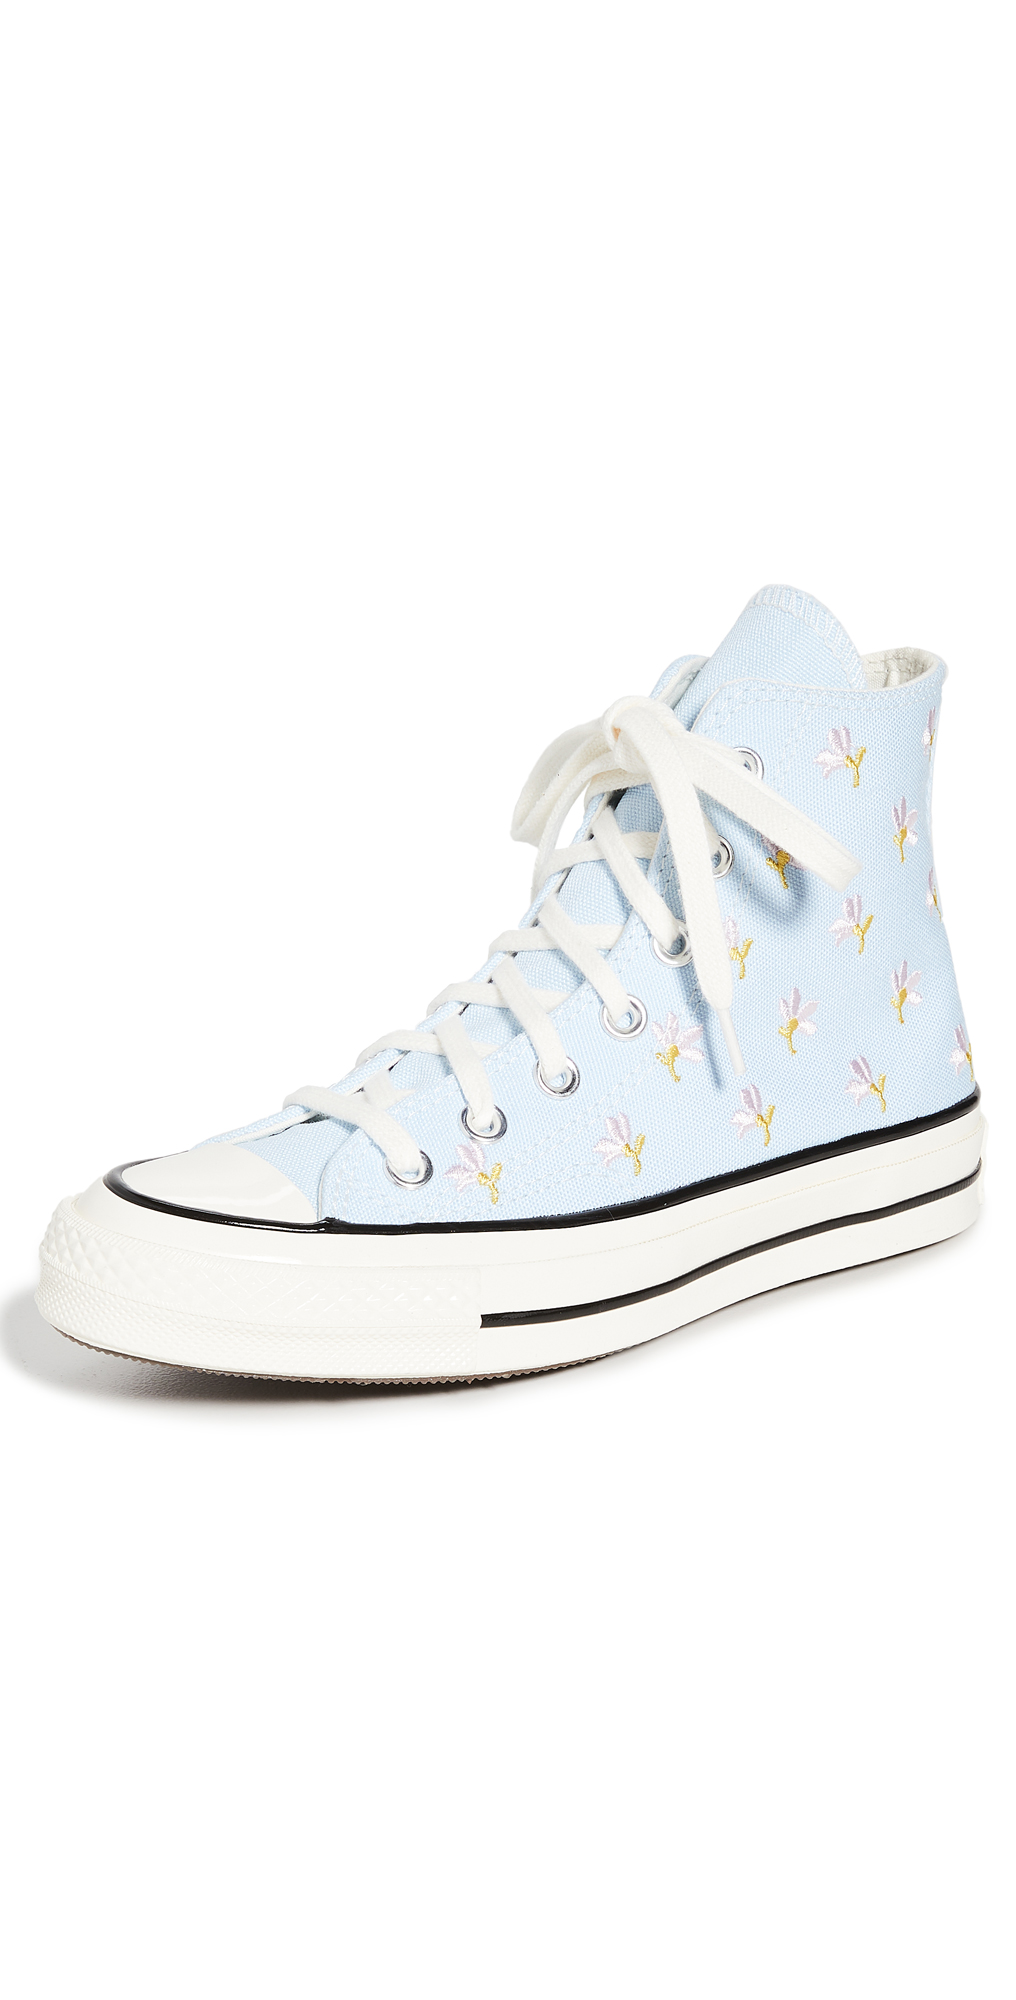 Converse Chuck 70 Embroidered Garden Party High Top Sneakers